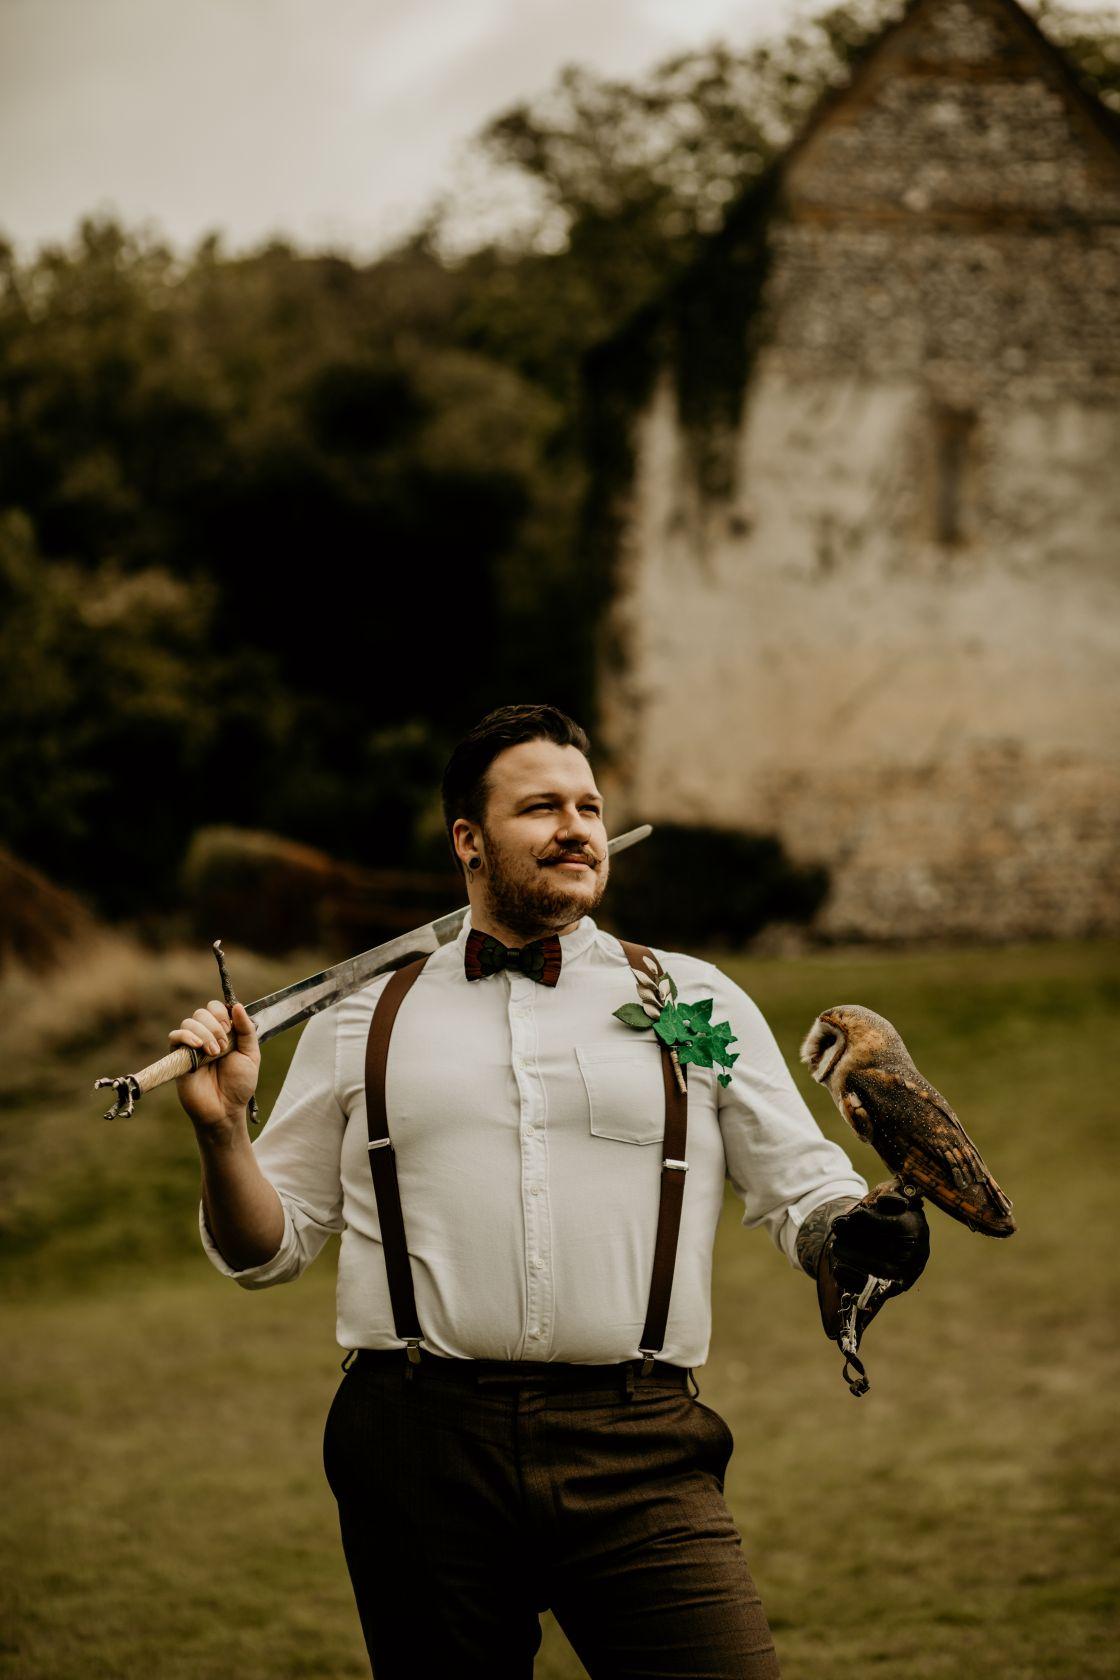 alternative fairytale wedding- snow white wedding- charlotte laurie designs-chloe mary photo- unconventional wedding- alternative wedding inspiration- sword at wedding- wedding owl- groom with owl